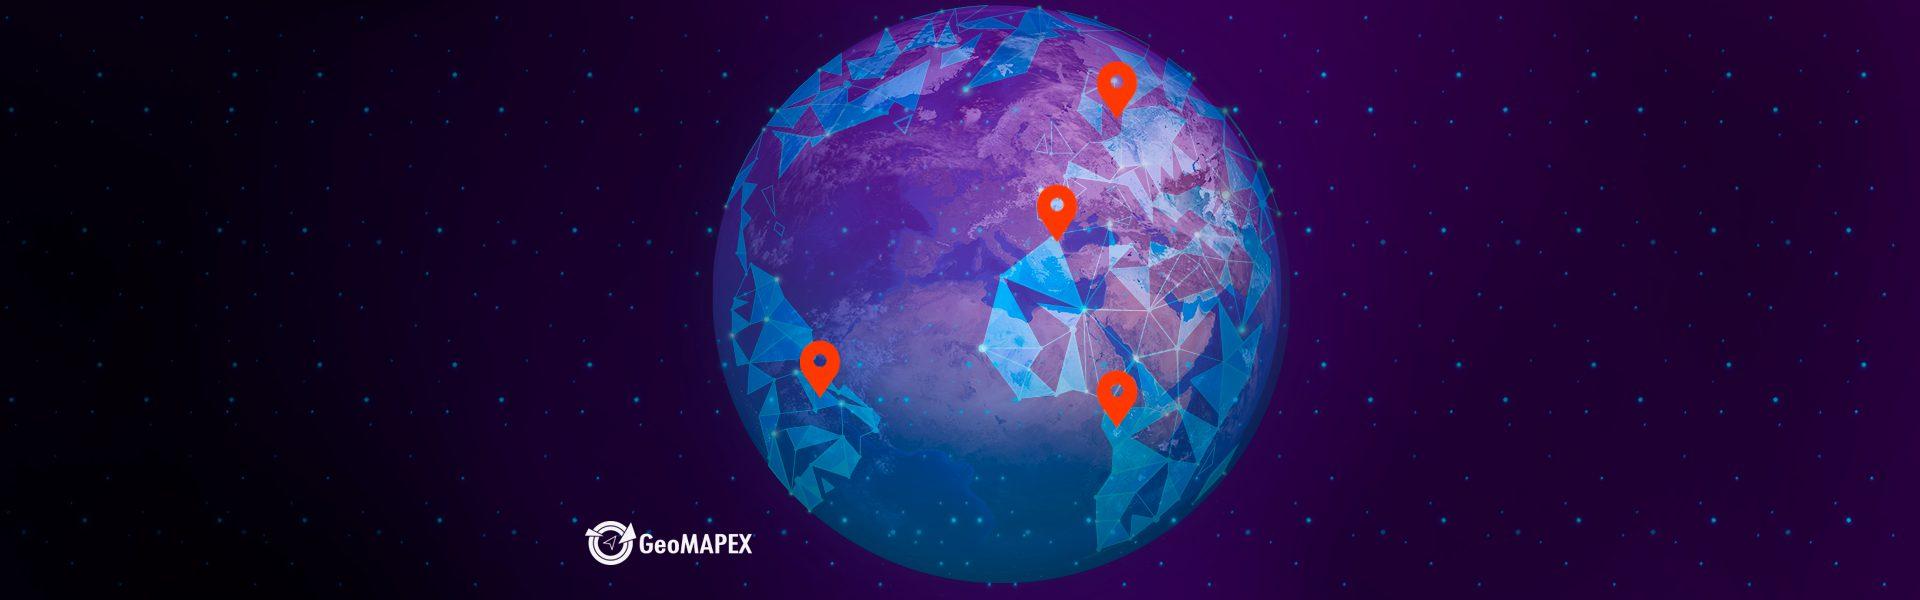 GeoMAPEX Banner - ATISoft